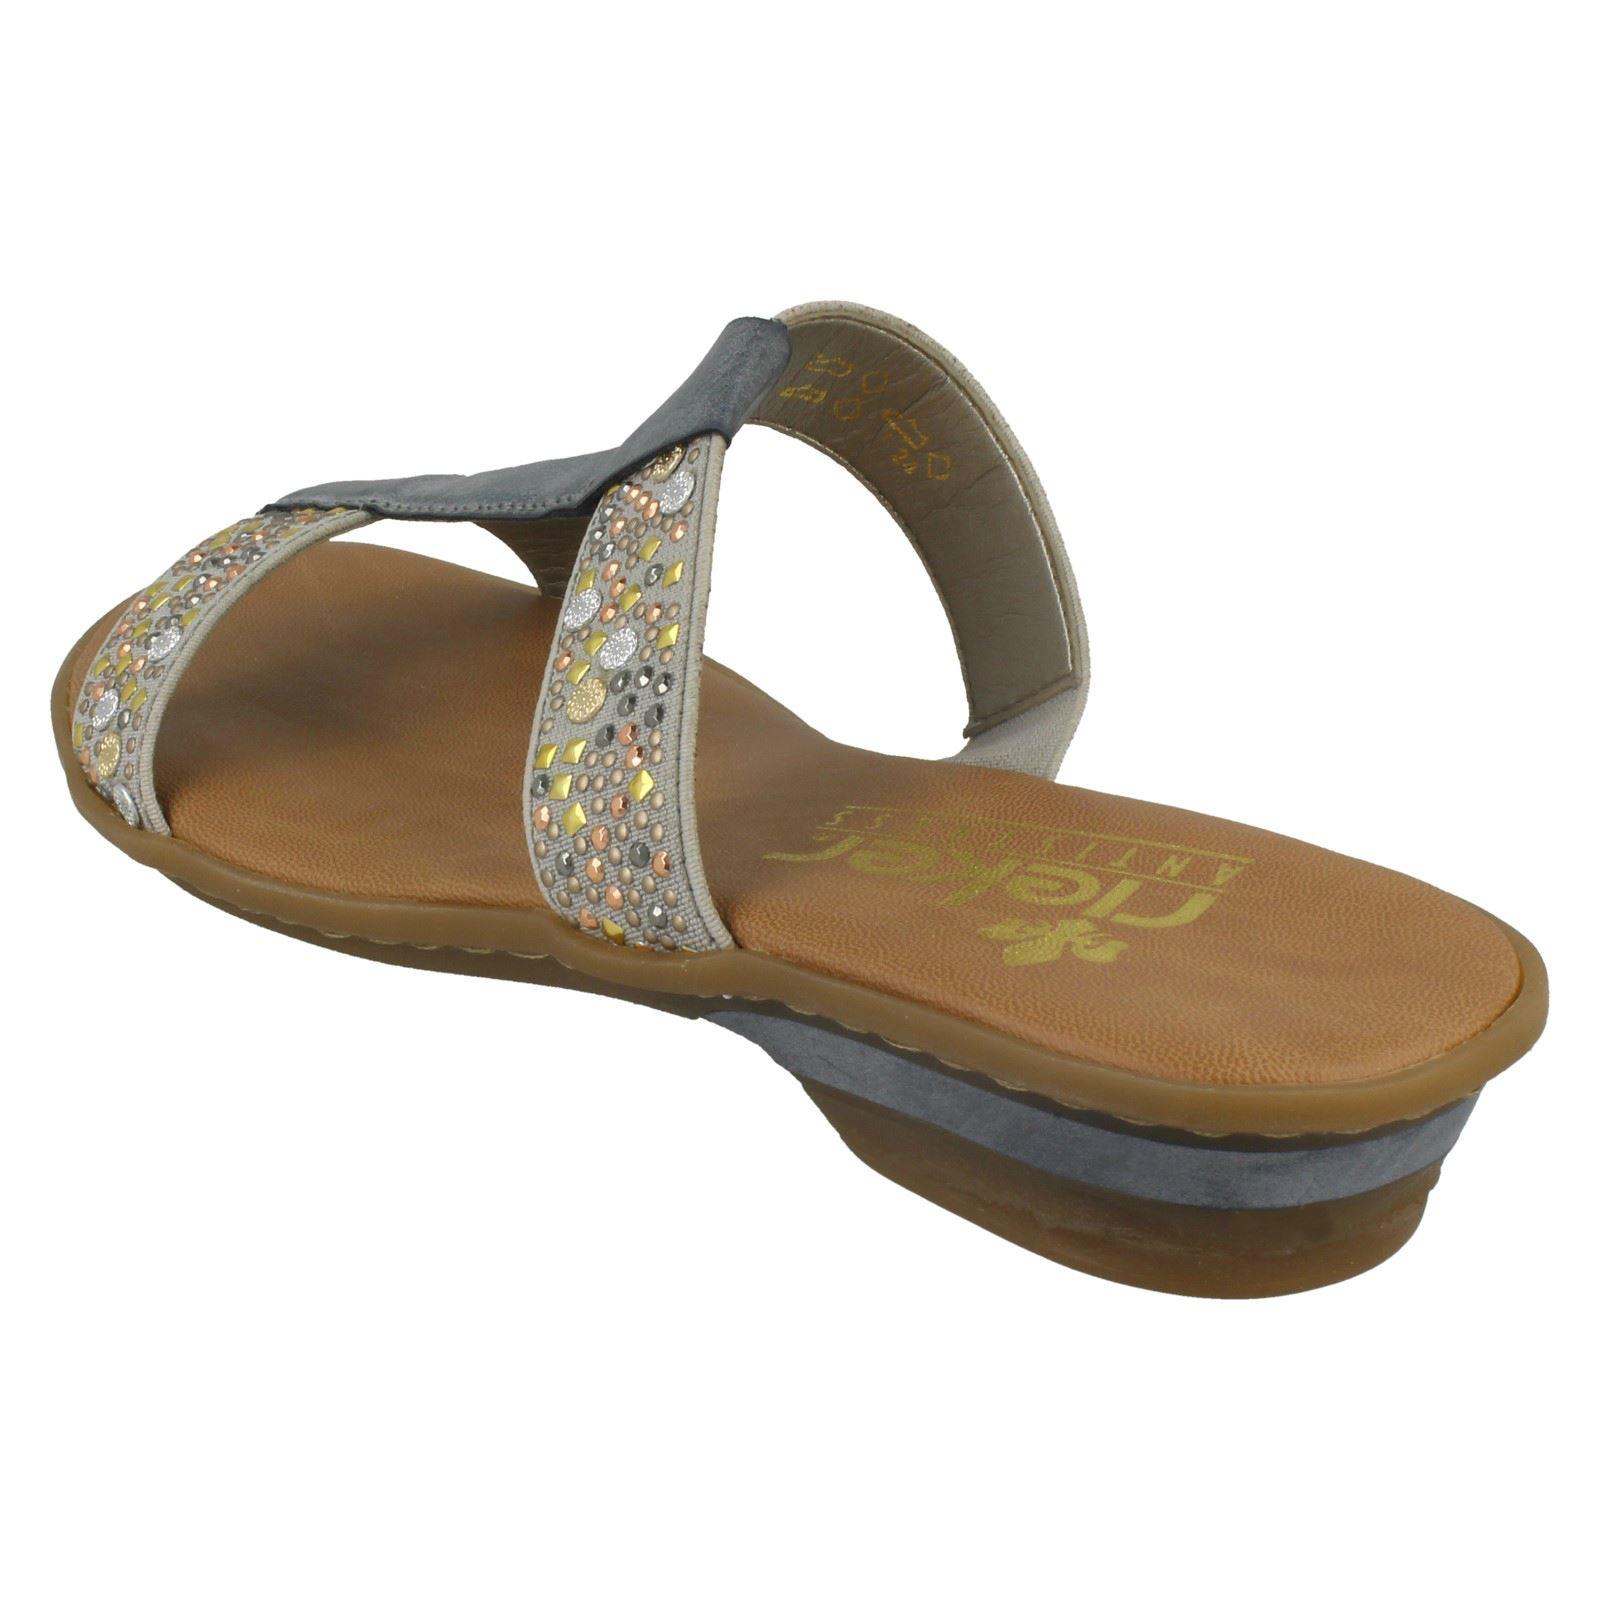 Toe Mule Rieker Synthetic Slip Casual Jewelled Sandals On Open Ladies 63454 Grey wOgHqg